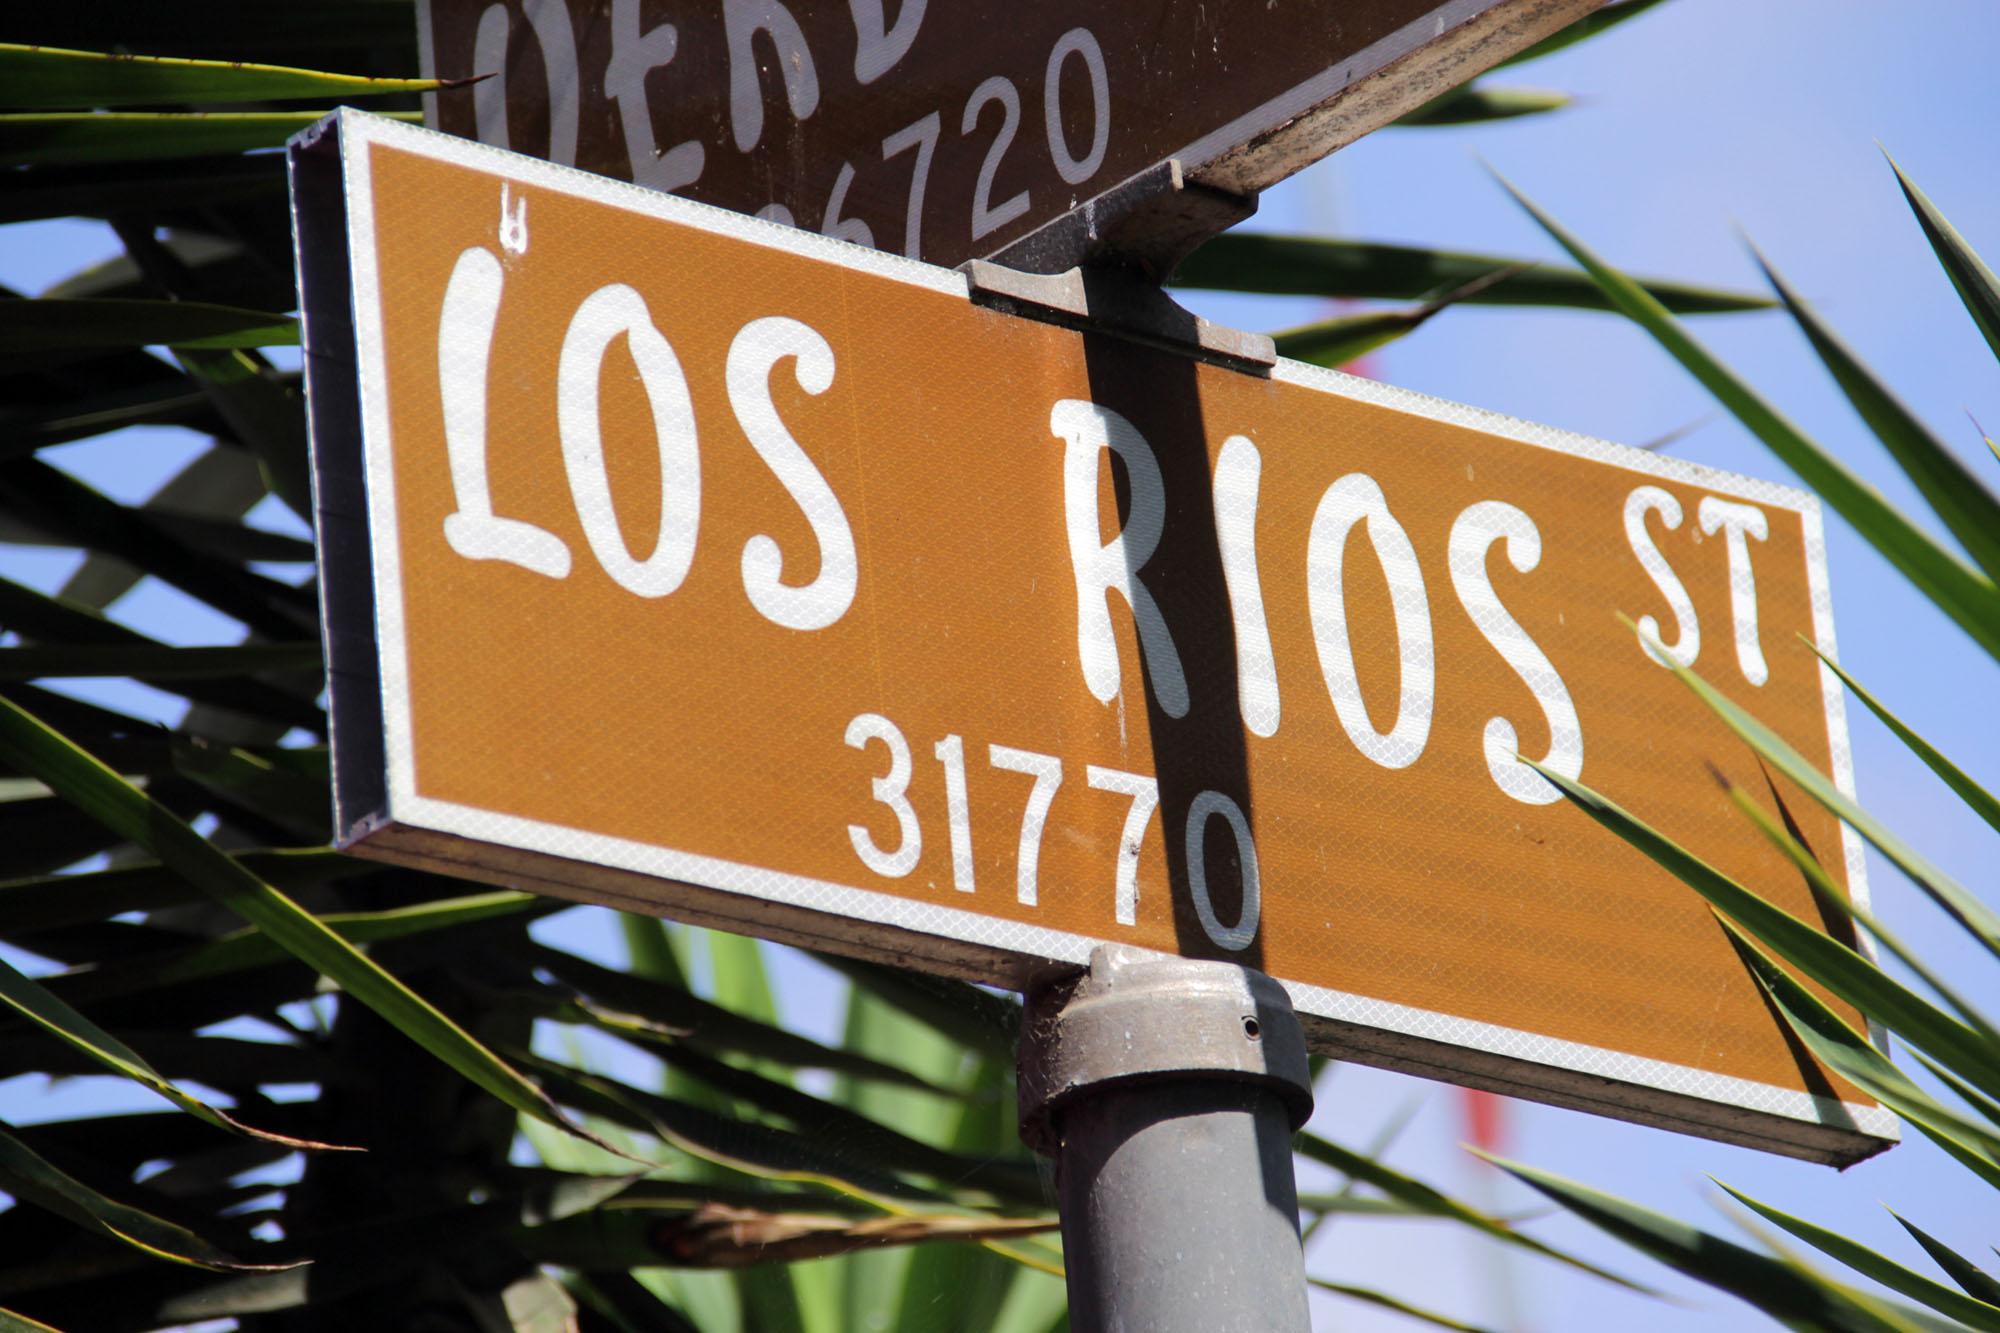 Los Rios Street sign in San Juan's downtown district. Photo: Shawn Raymundo